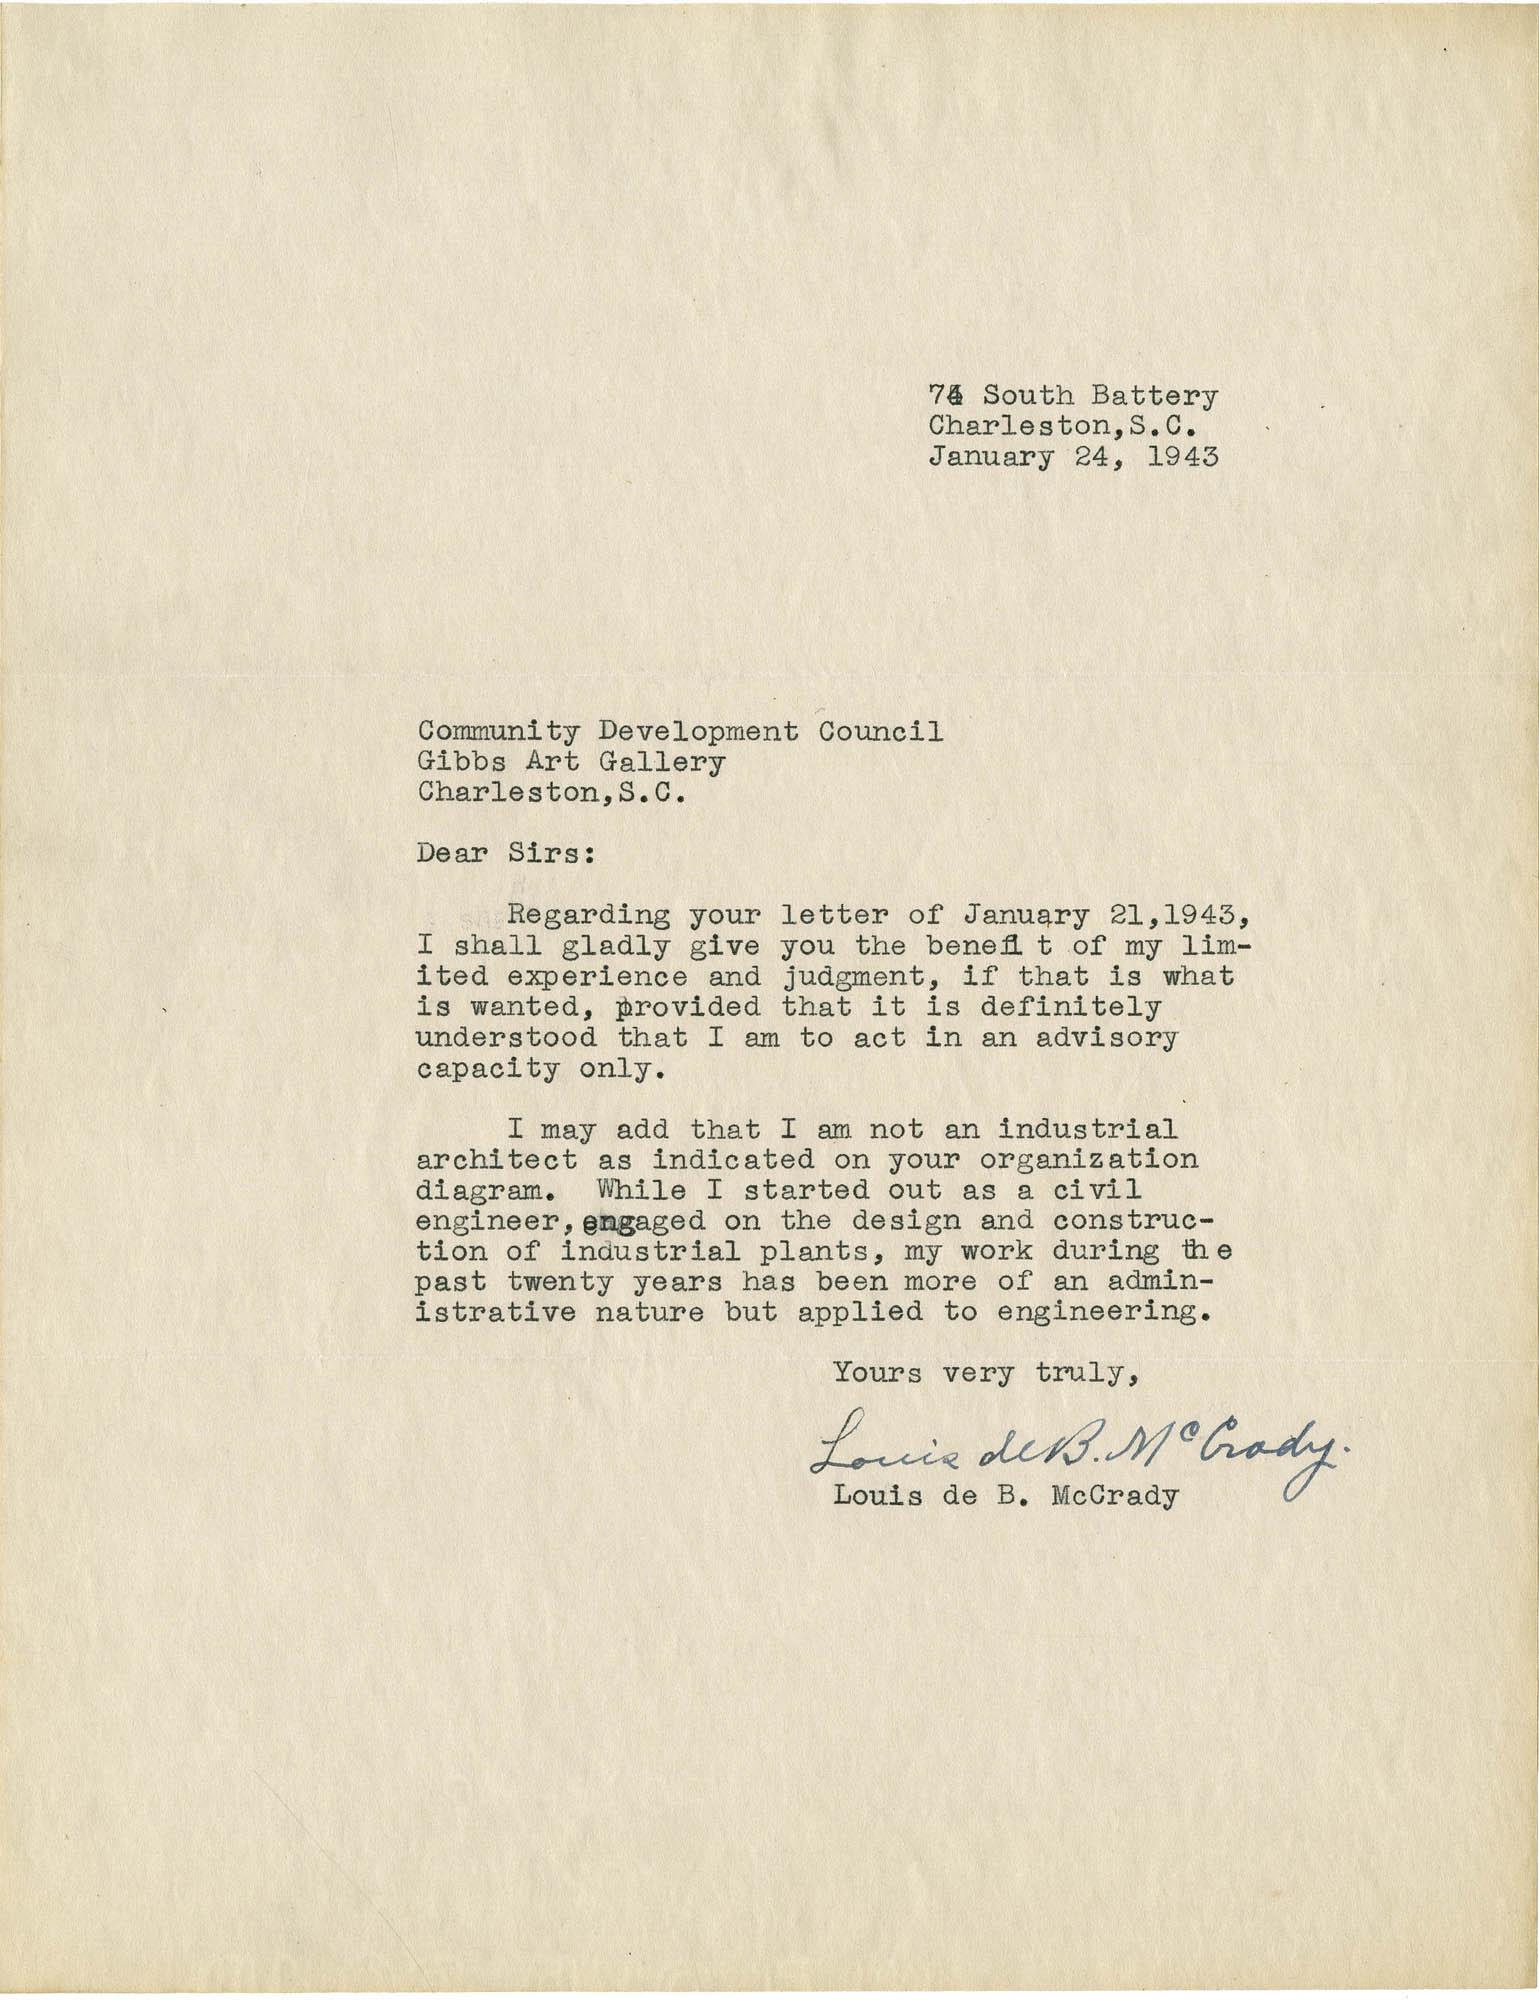 Folder 32: McCrady Letter